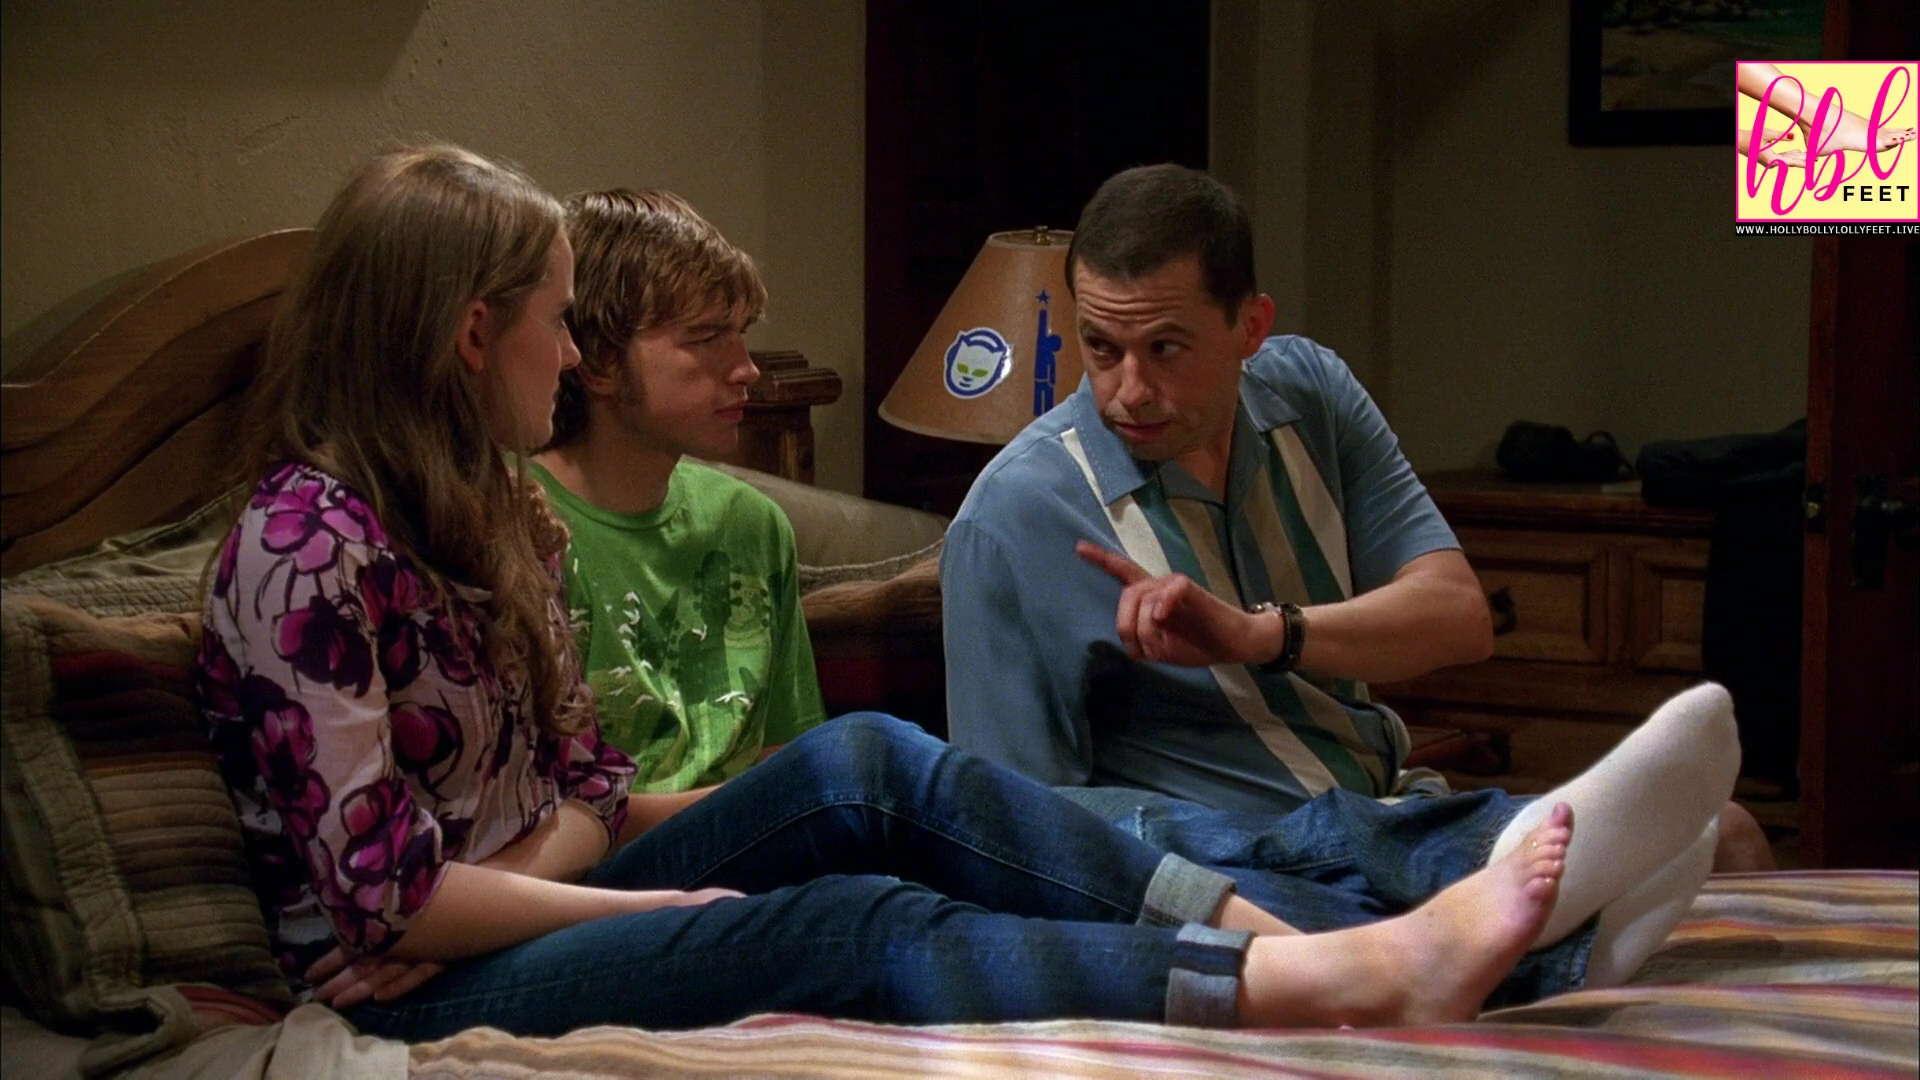 Macey Cruthird Feet Sole - Holly Bolly Lolly Feet (HBL Feet)